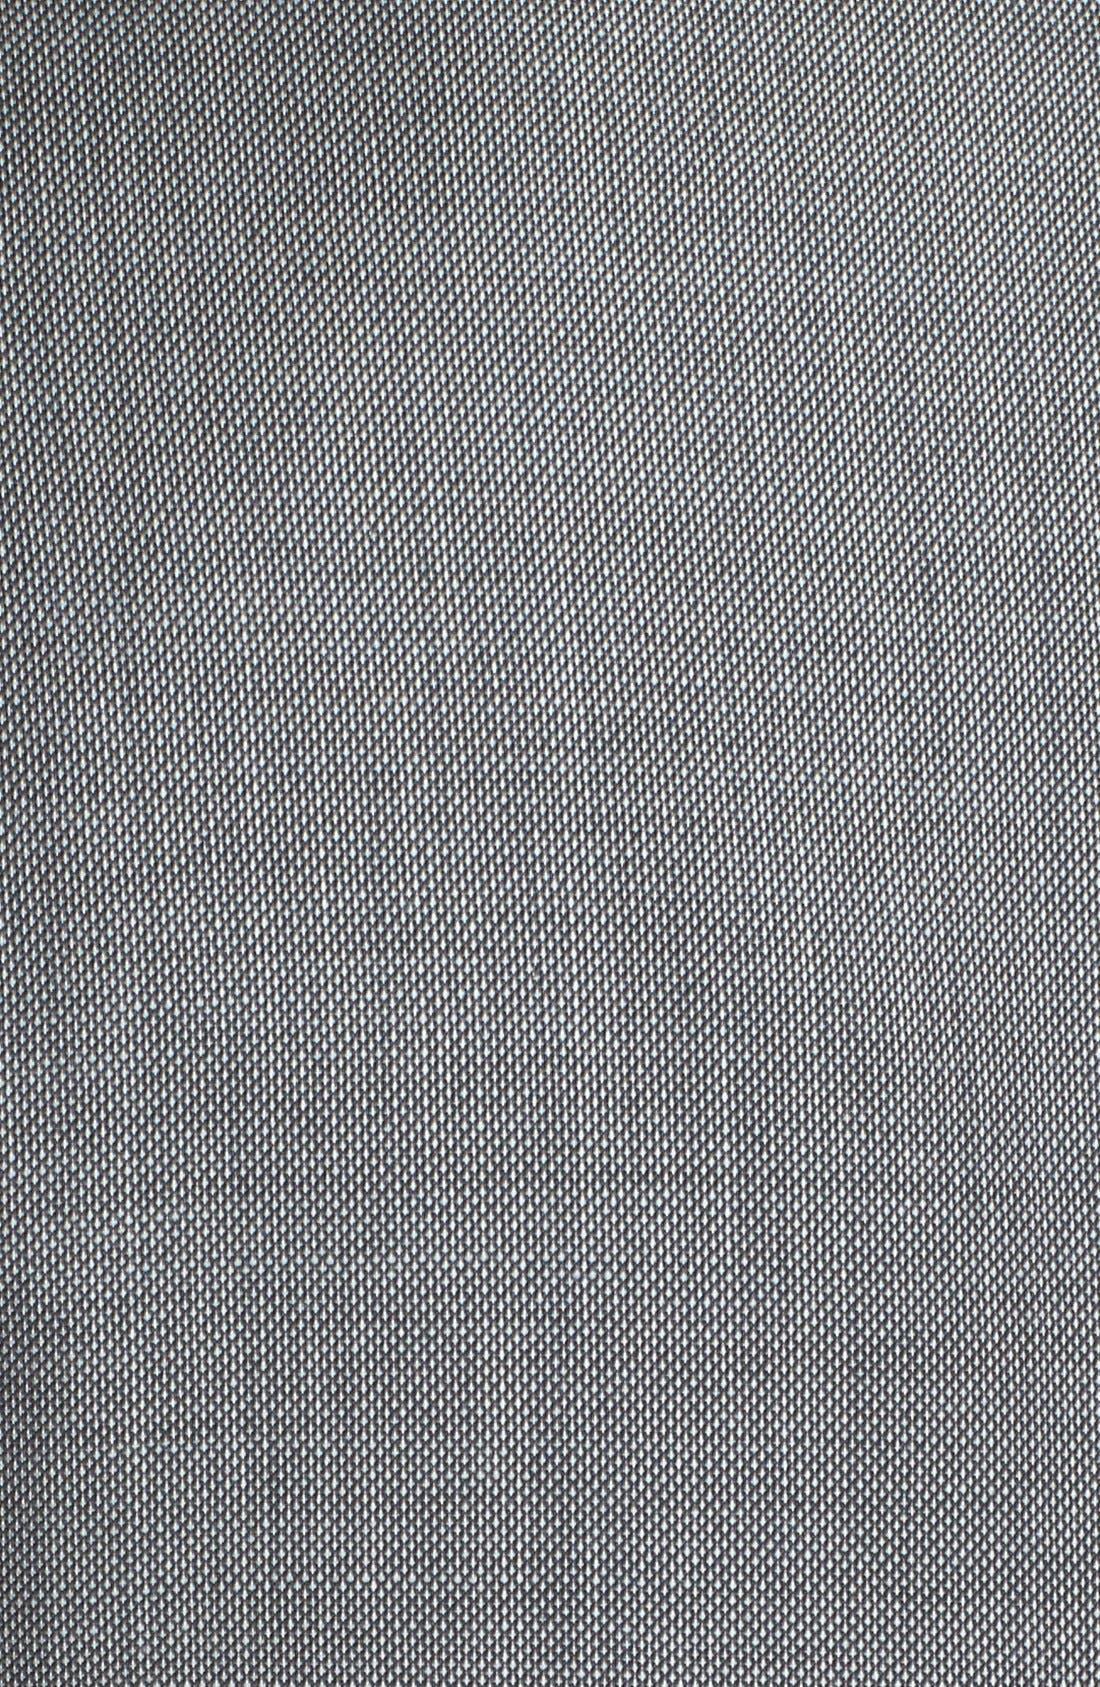 Alternate Image 3  - BOSS HUGO BOSS 'Keys' Trim Fit Wool Sport Coat (Online Only)